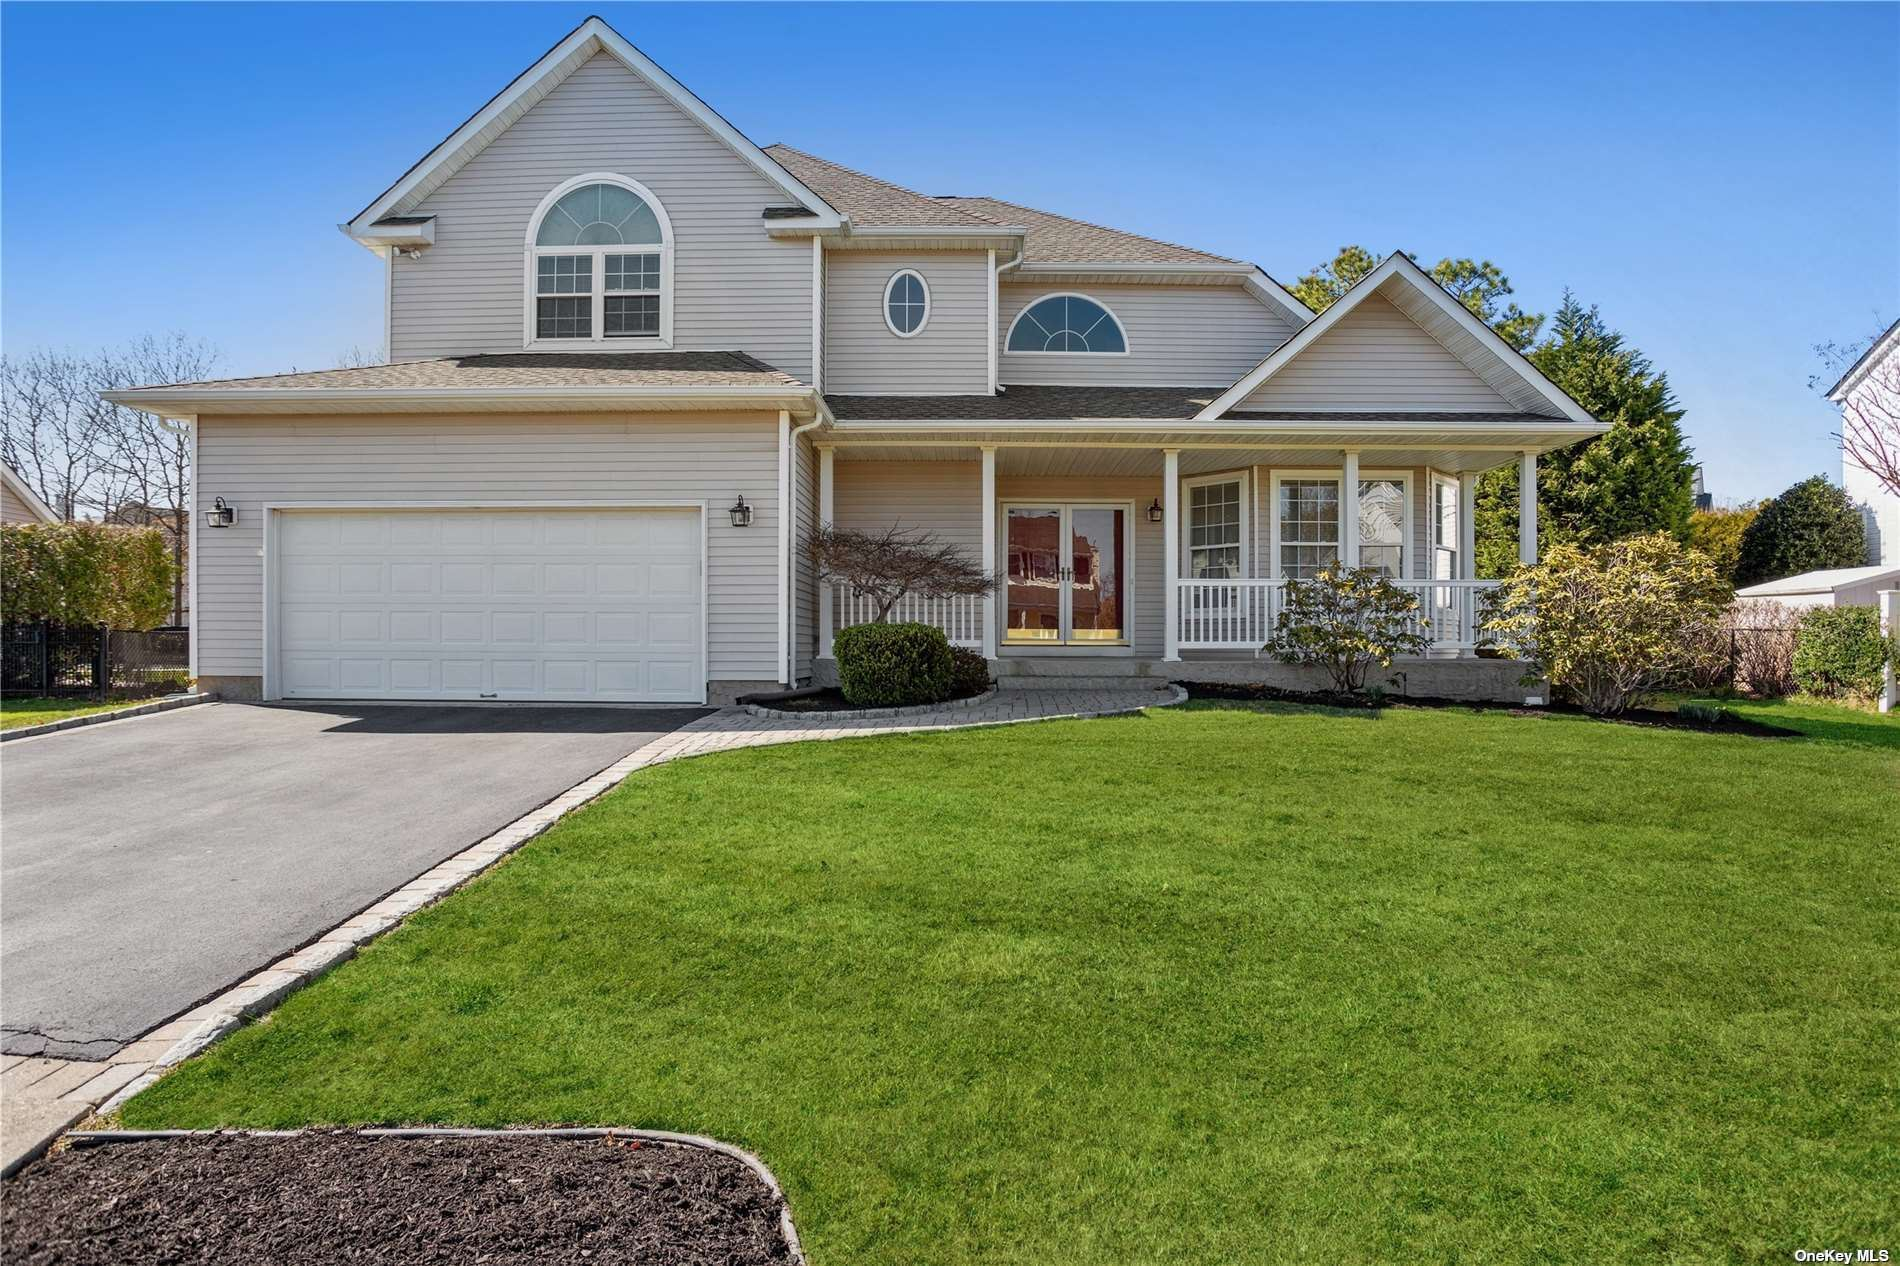 23 Summerfield Drive, Holtsville, NY 11742 - MLS#: 3301138